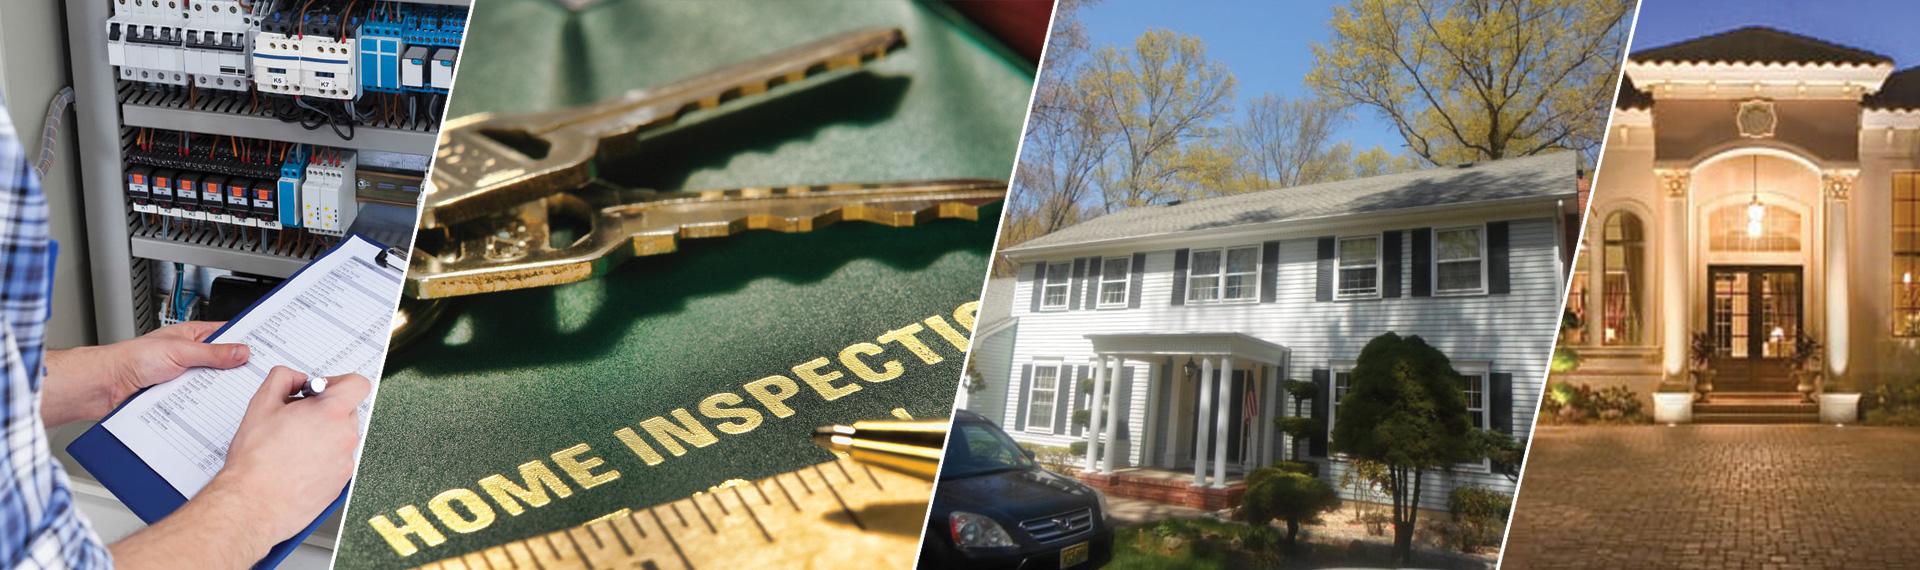 AAA House Doctors Engineers & Home Inspectors Plainsboro NJ